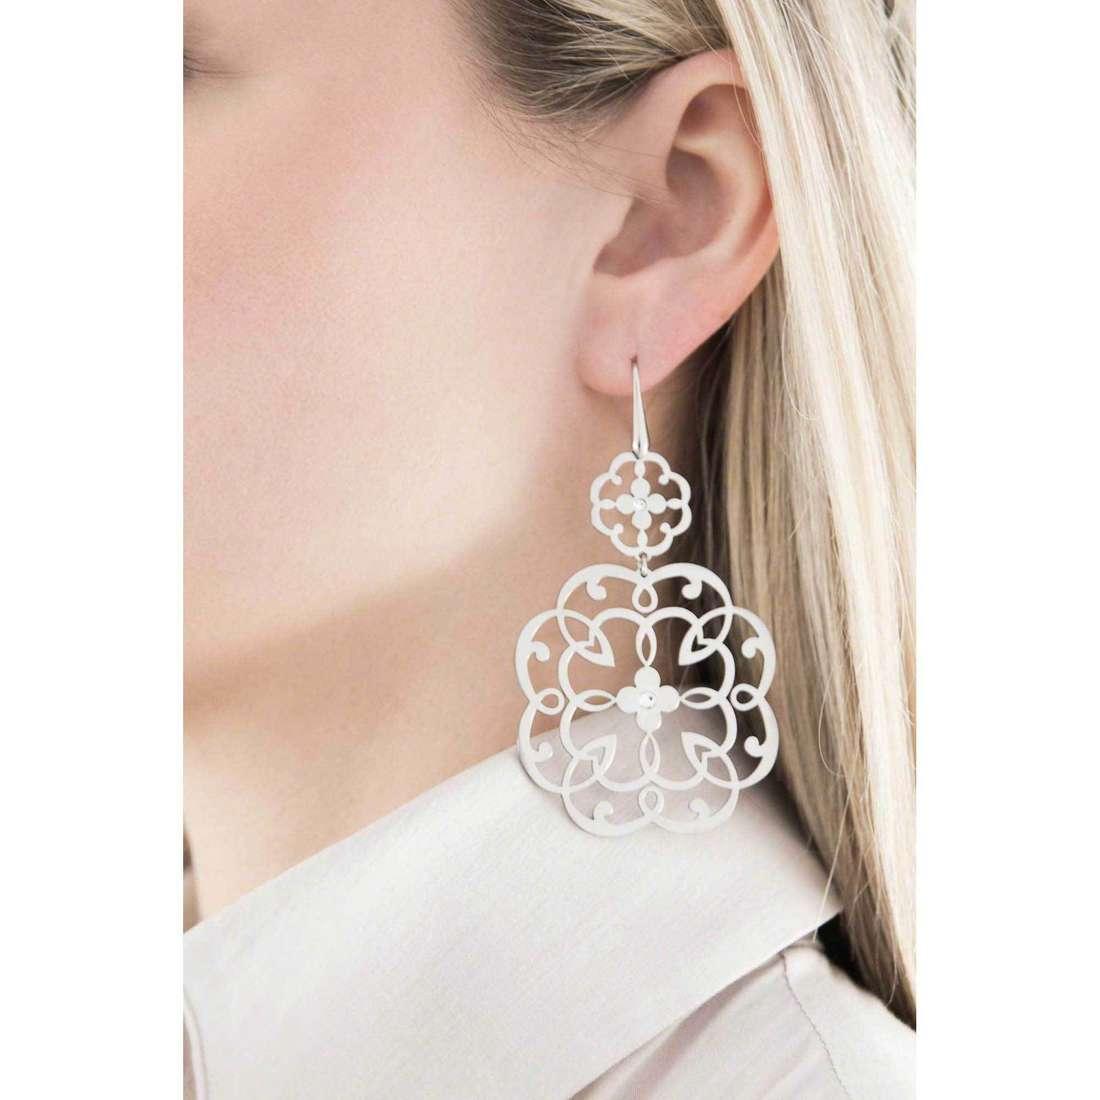 Morellato boucles d'oreille Arabesco femme SAAJ11 indosso